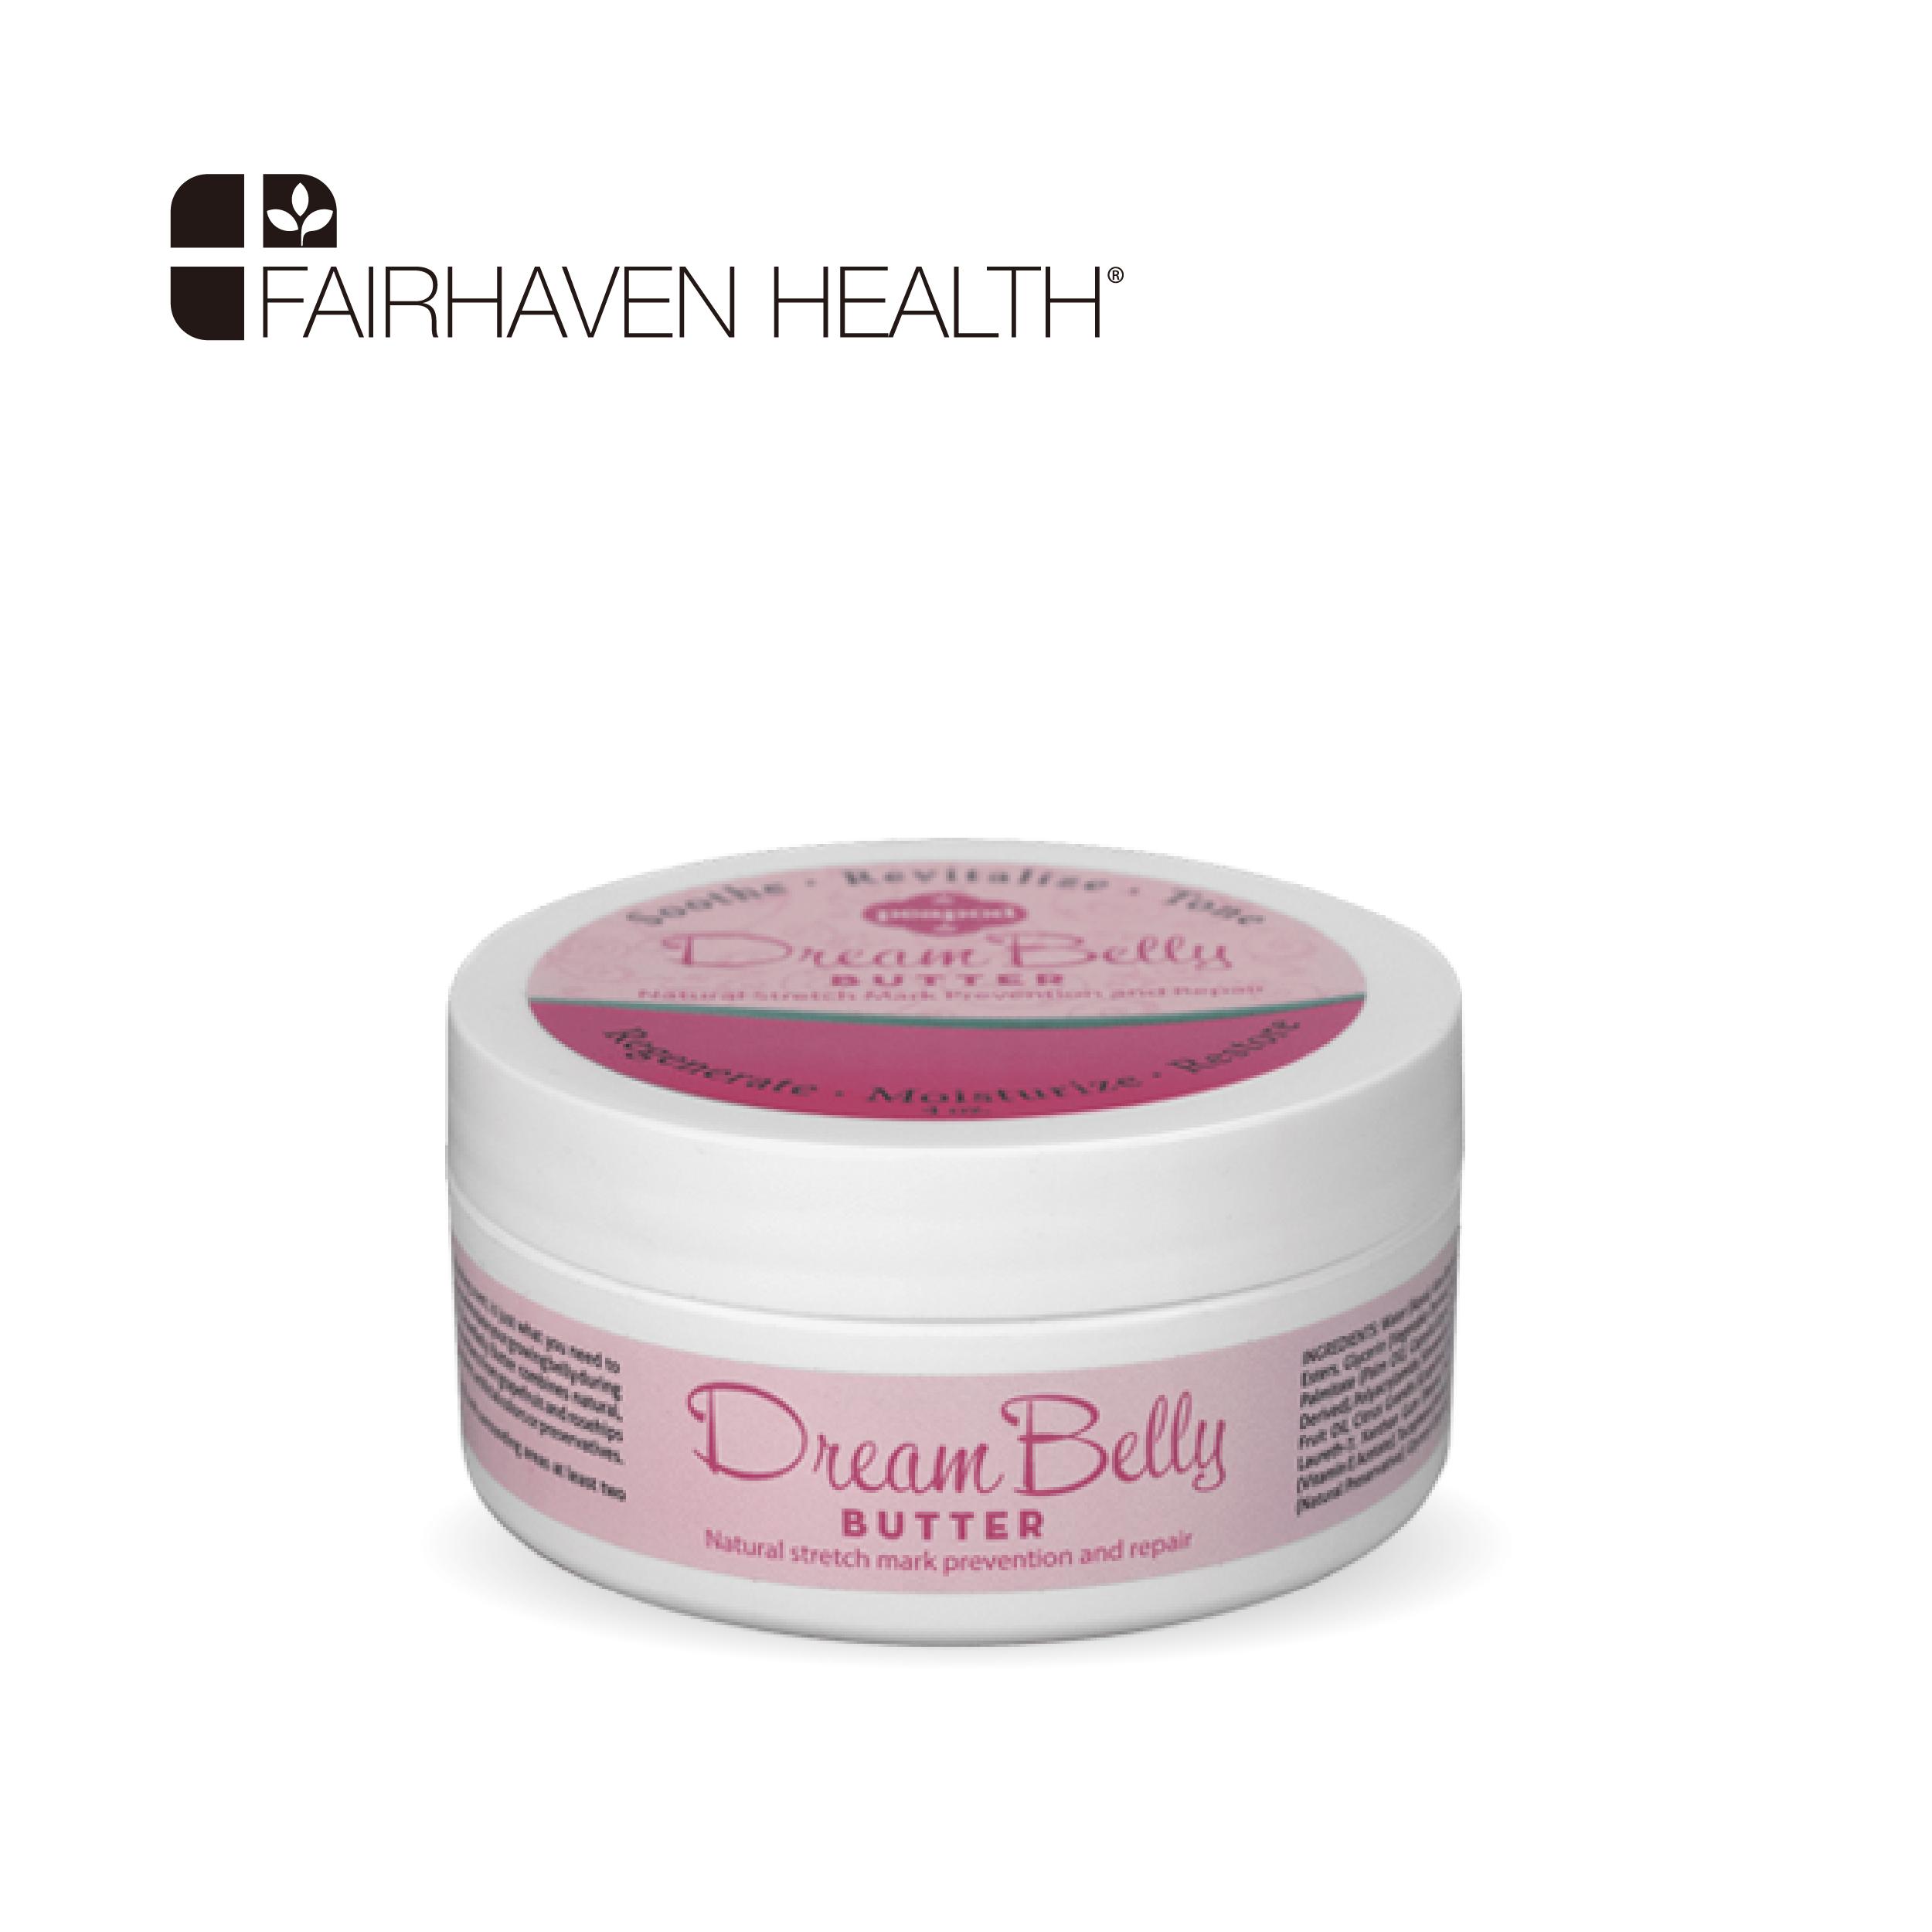 Fairhaven Health 孕期妊娠纹疤痕膏 4oz